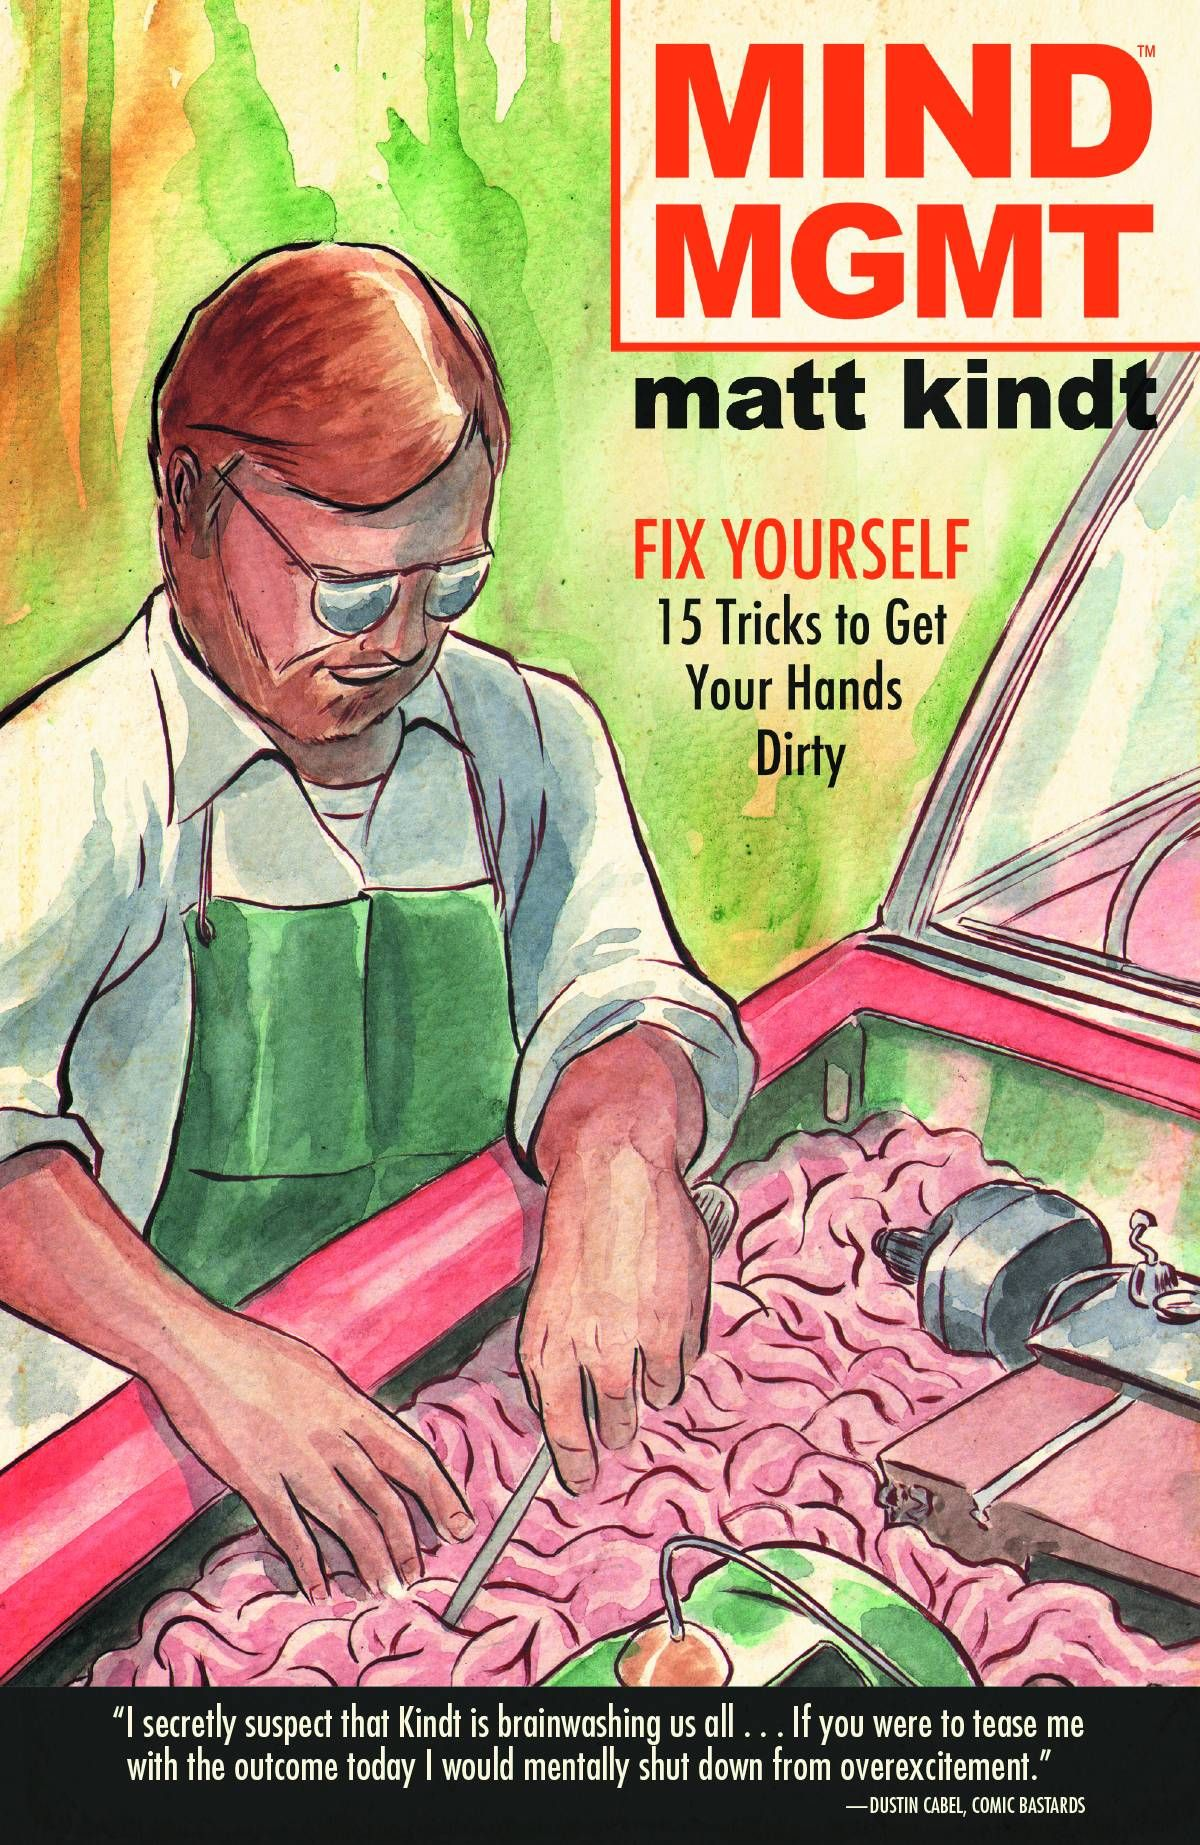 Mind MGMT #15 (Virgin Cover) #DarkHorse #MindMGMT (Cover Artist: Matt Kindt) On Sale: 9/25/2013